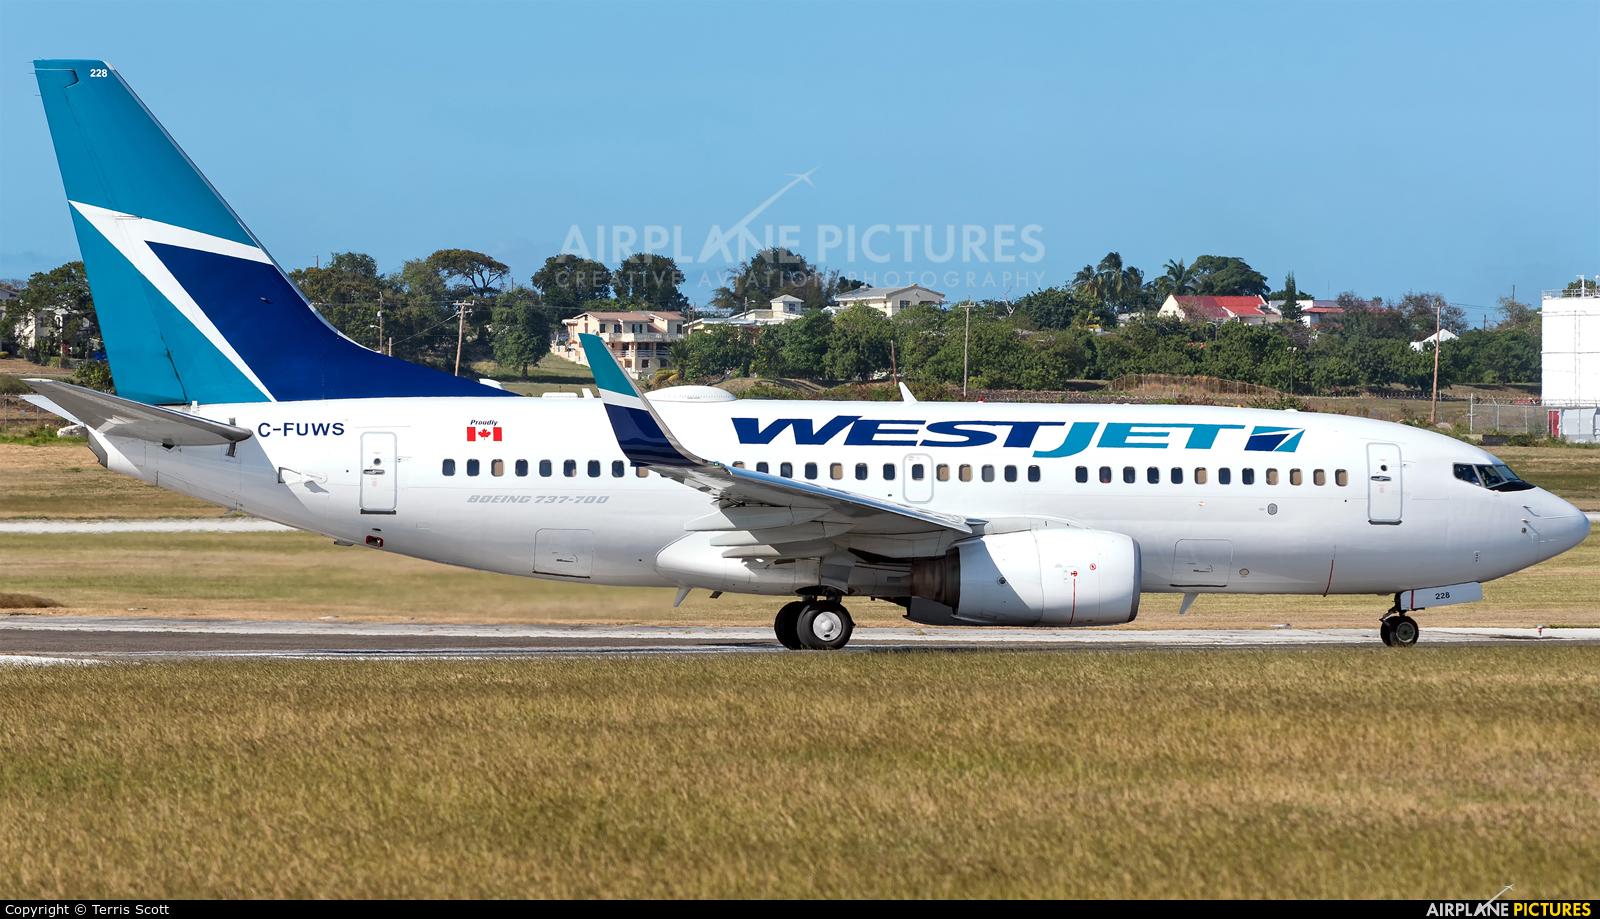 WestJet Airlines C-FUWS aircraft at Bridgetown